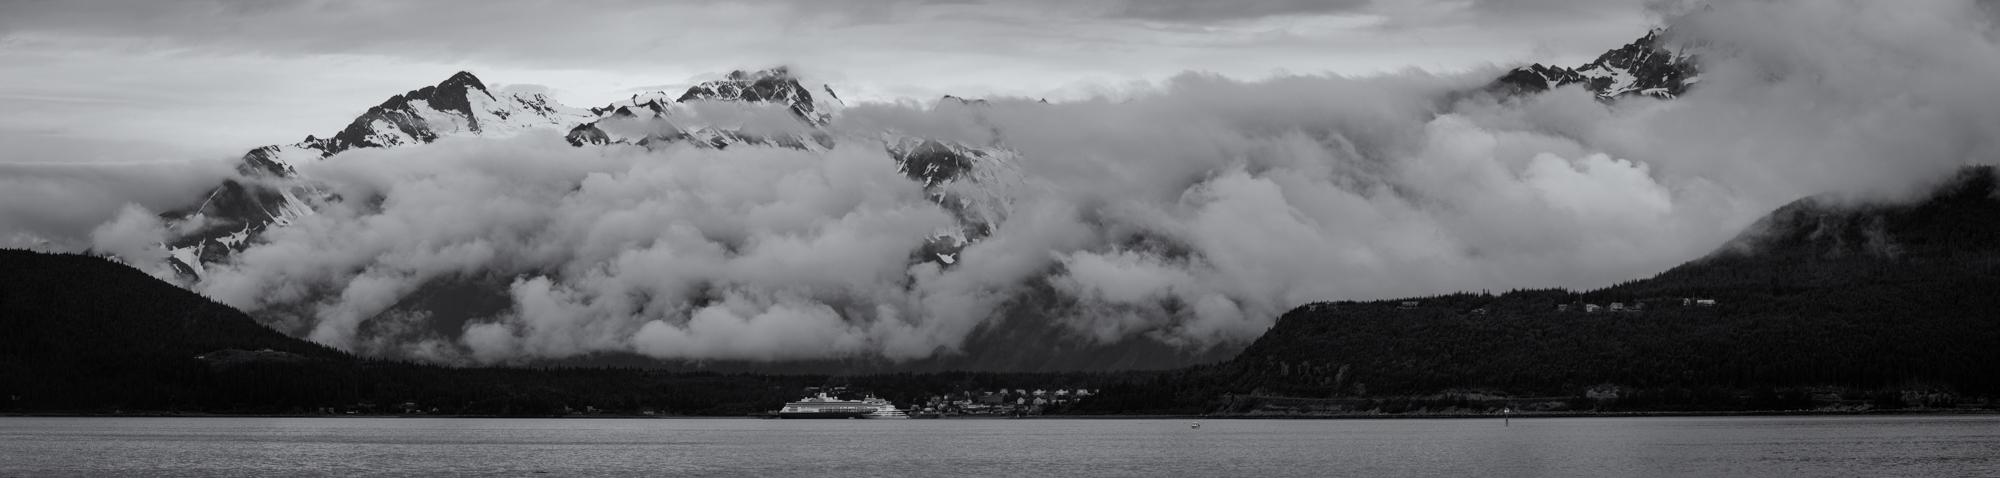 Alaska panhandle.jpg